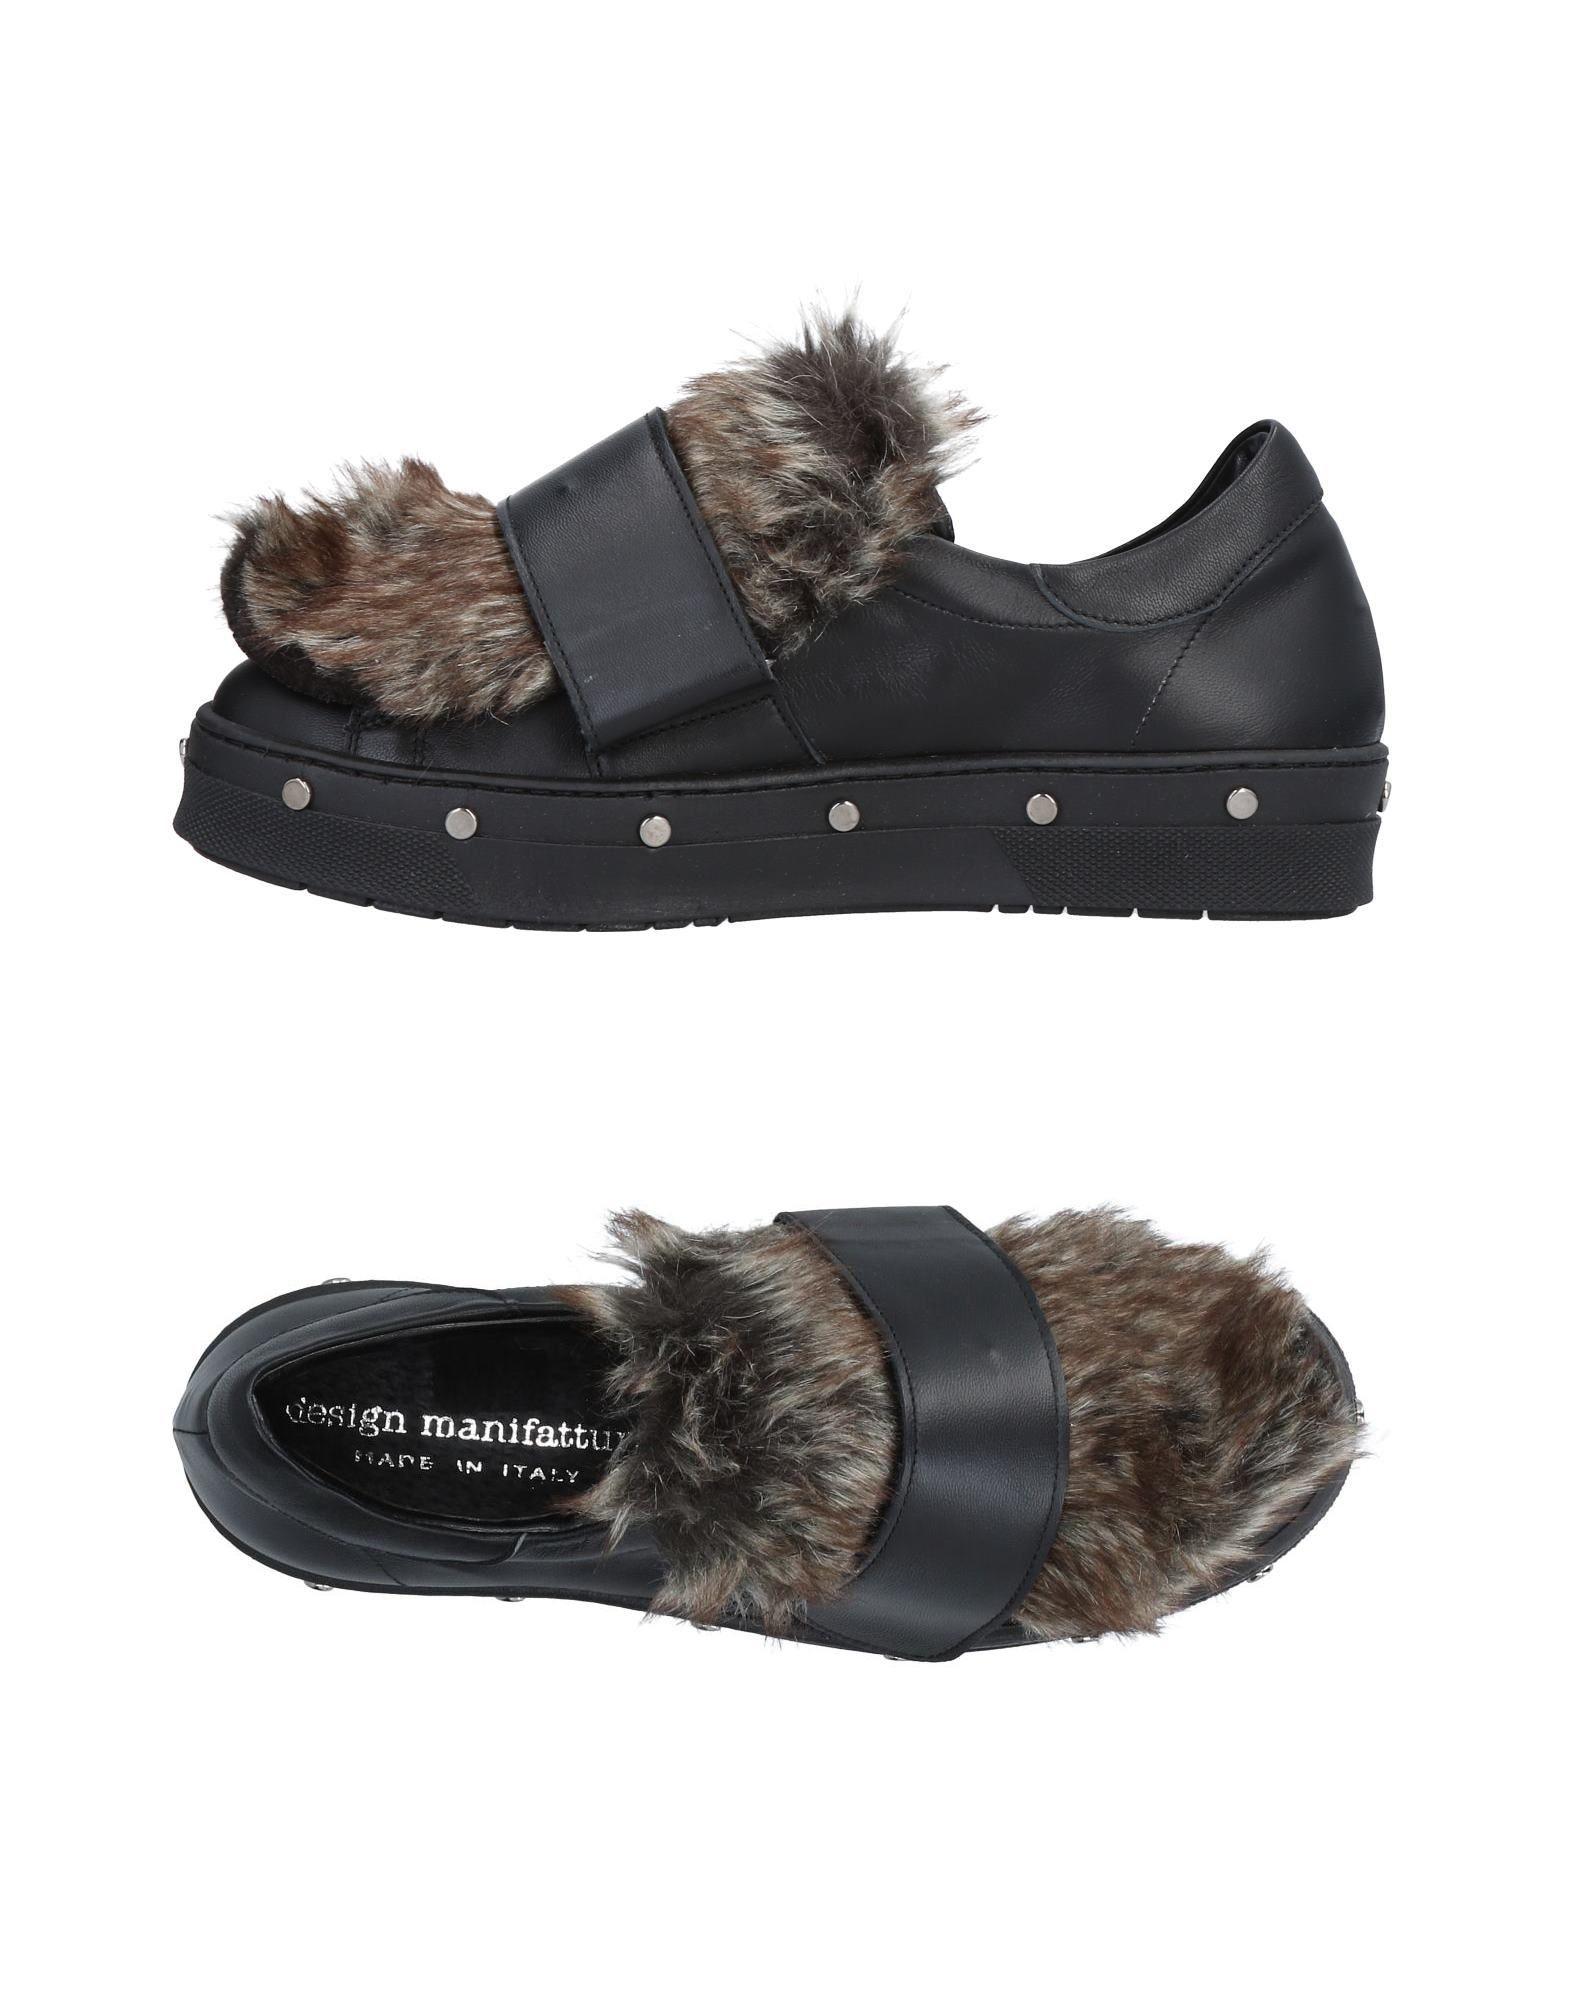 Sneakers Design Manifattura Donna - 11476118PK